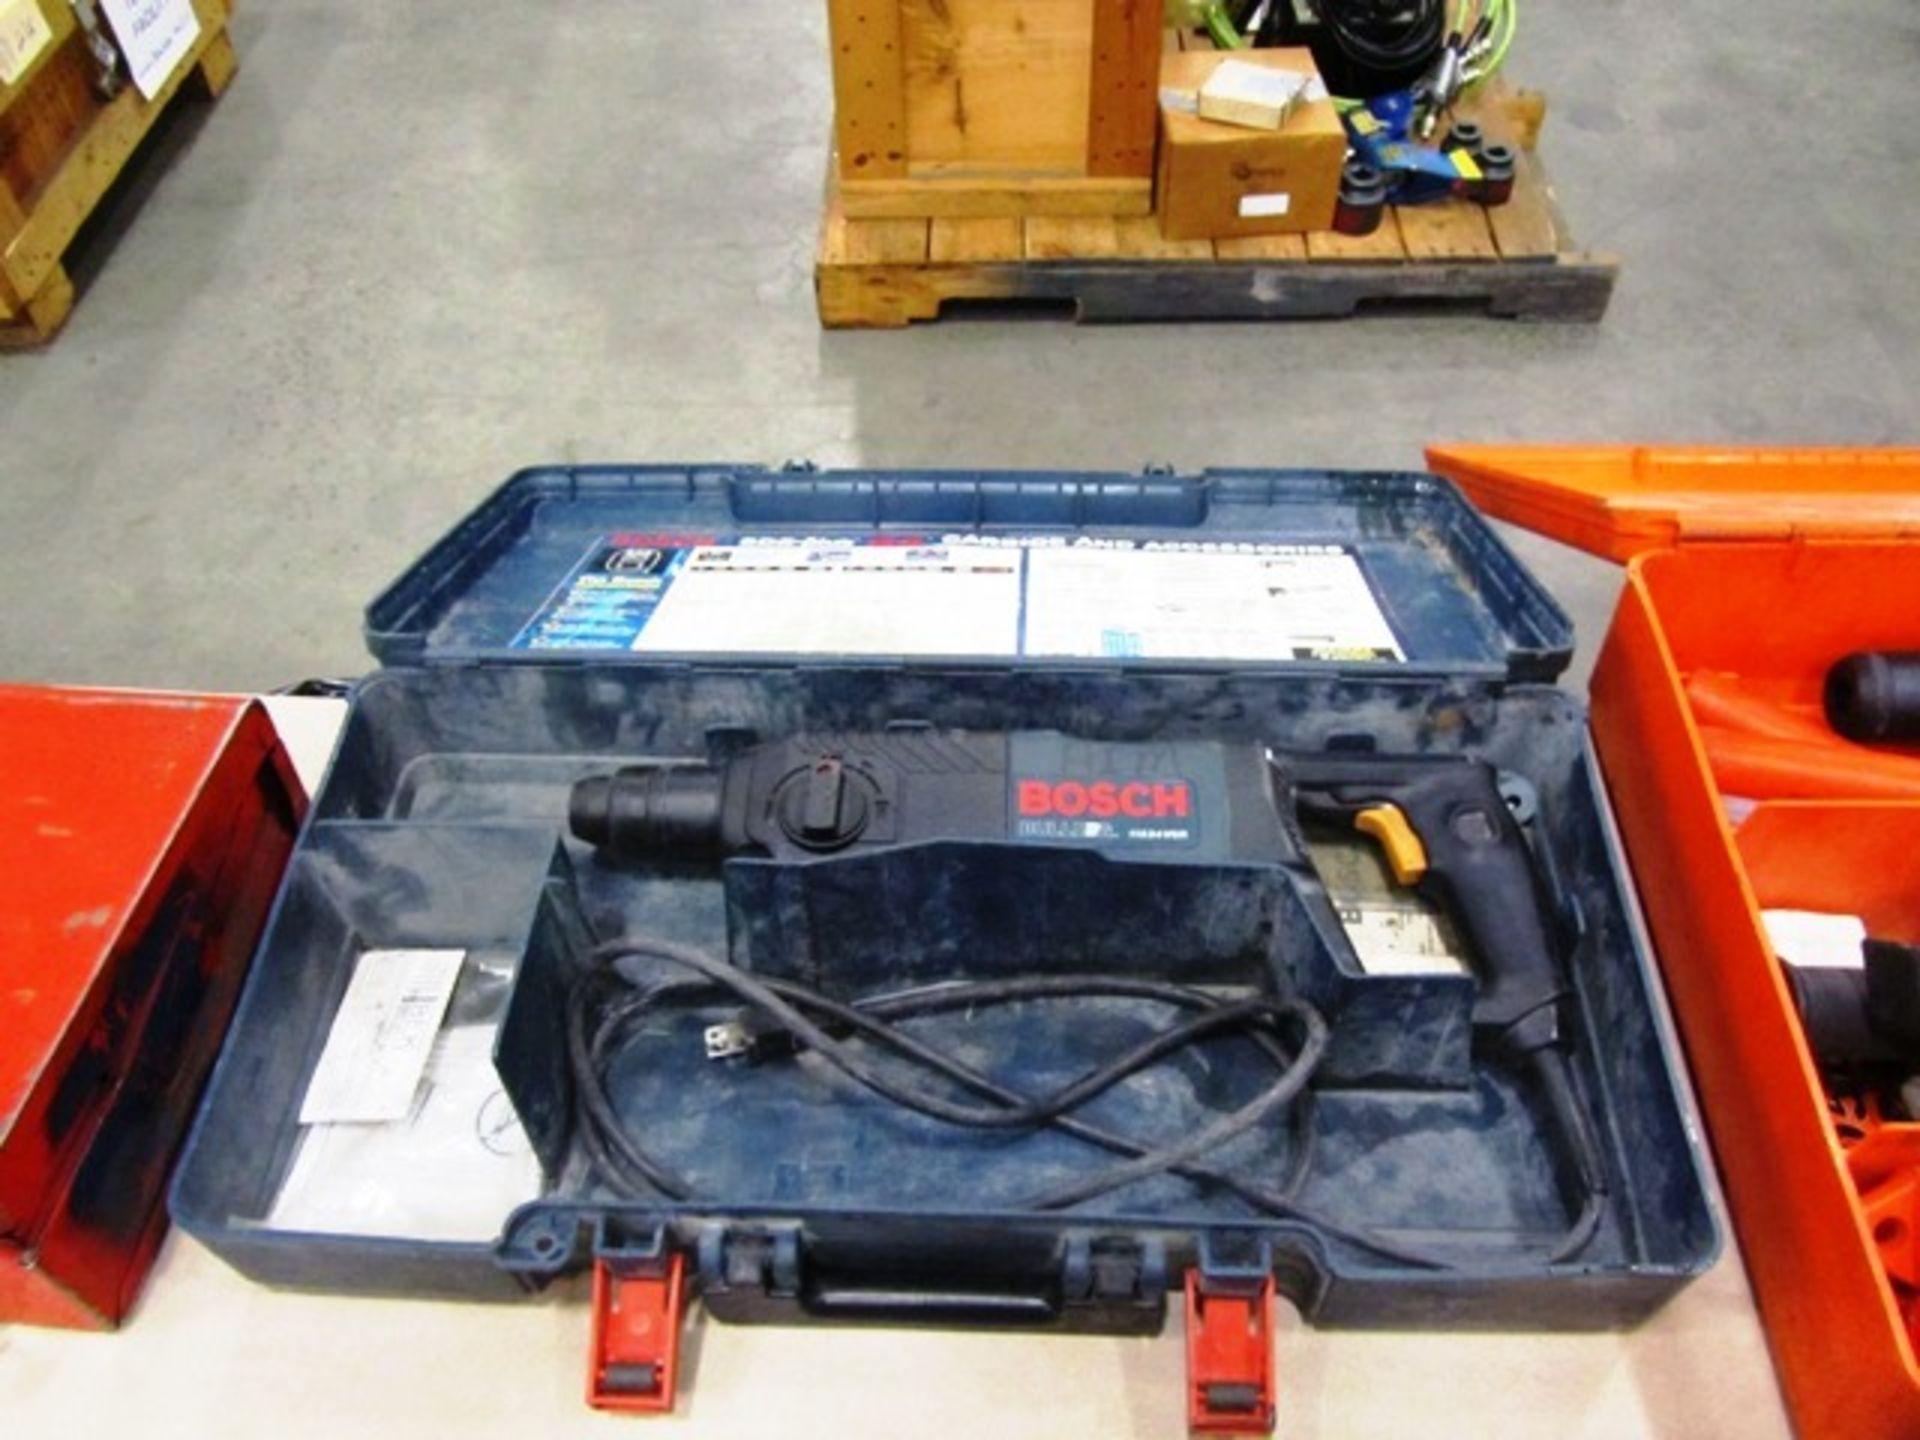 Bosch Bulldog Electric Hammer Drill